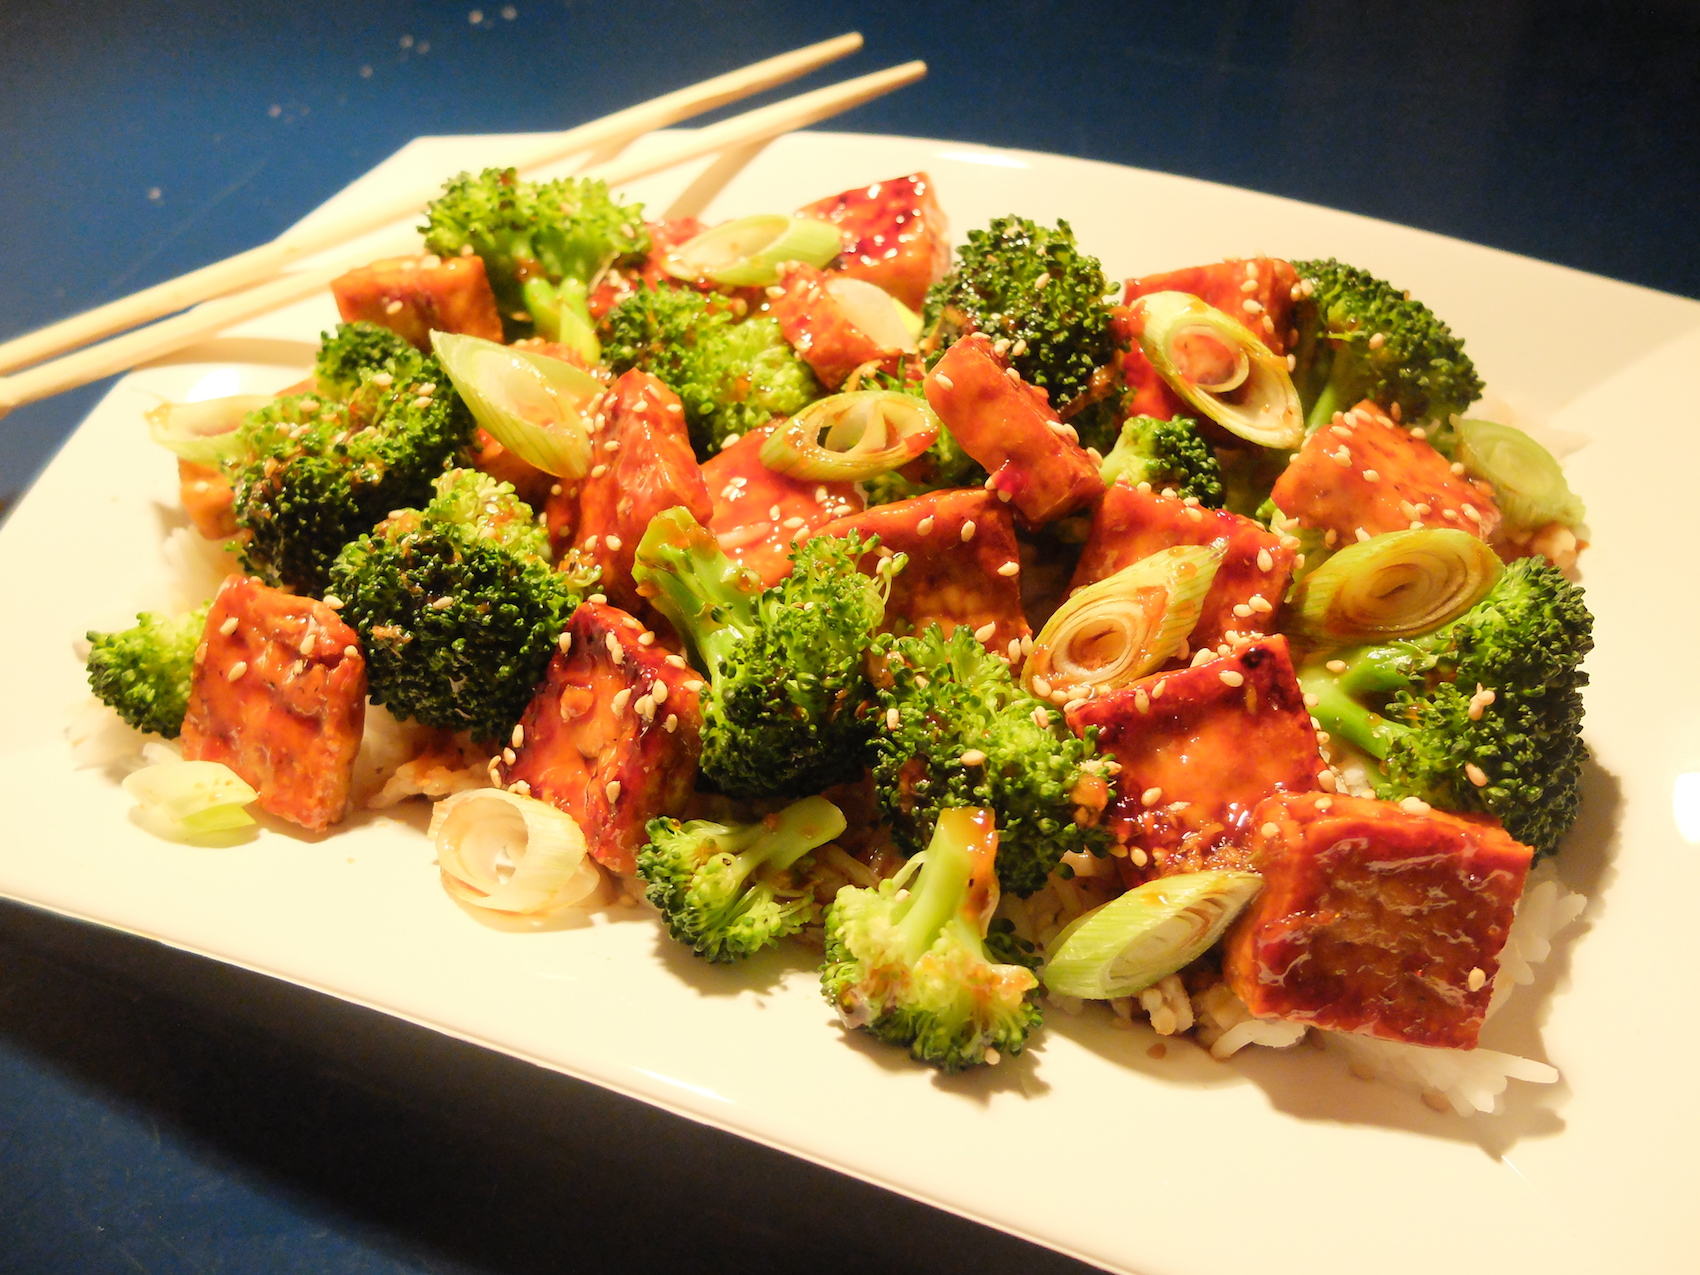 cookinesi asia tofu mit broccoli und fr hlingszwiebeln. Black Bedroom Furniture Sets. Home Design Ideas